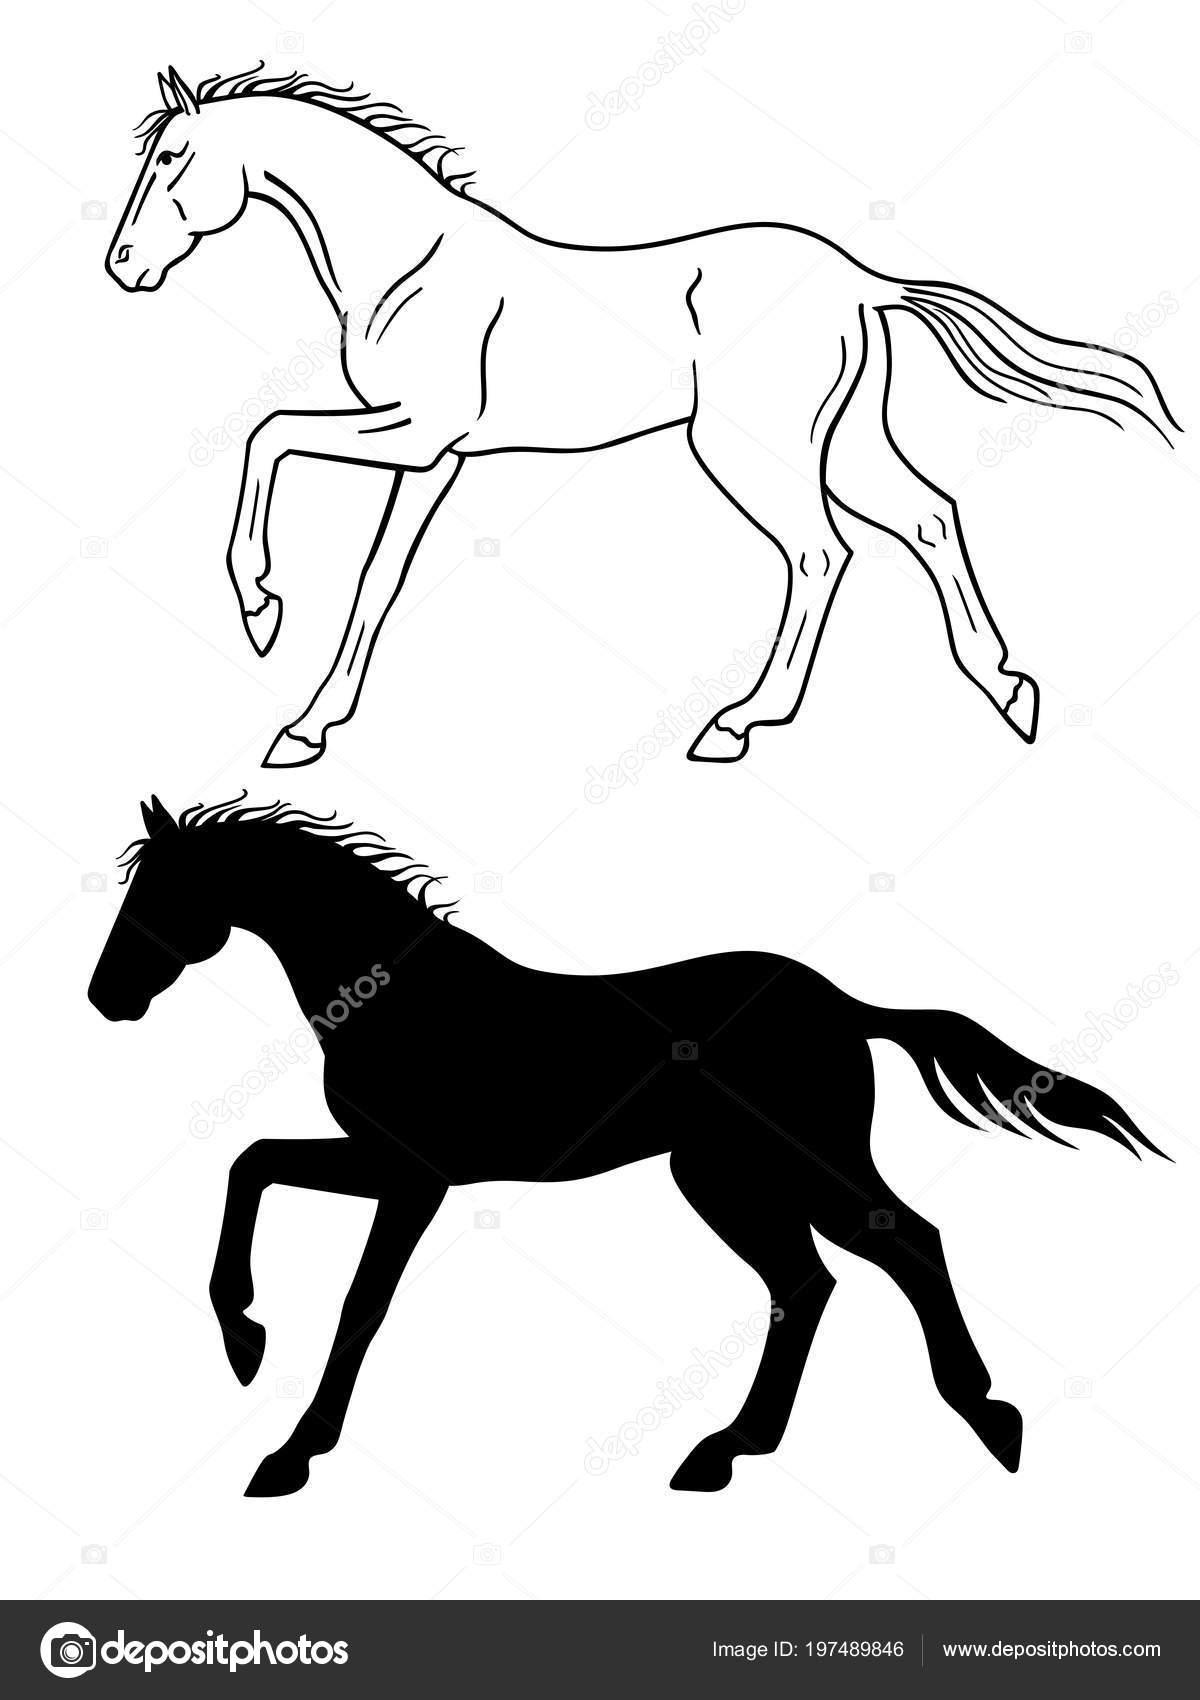 Dibujos Caballos Corriendo Carreras Caballo Galopa También